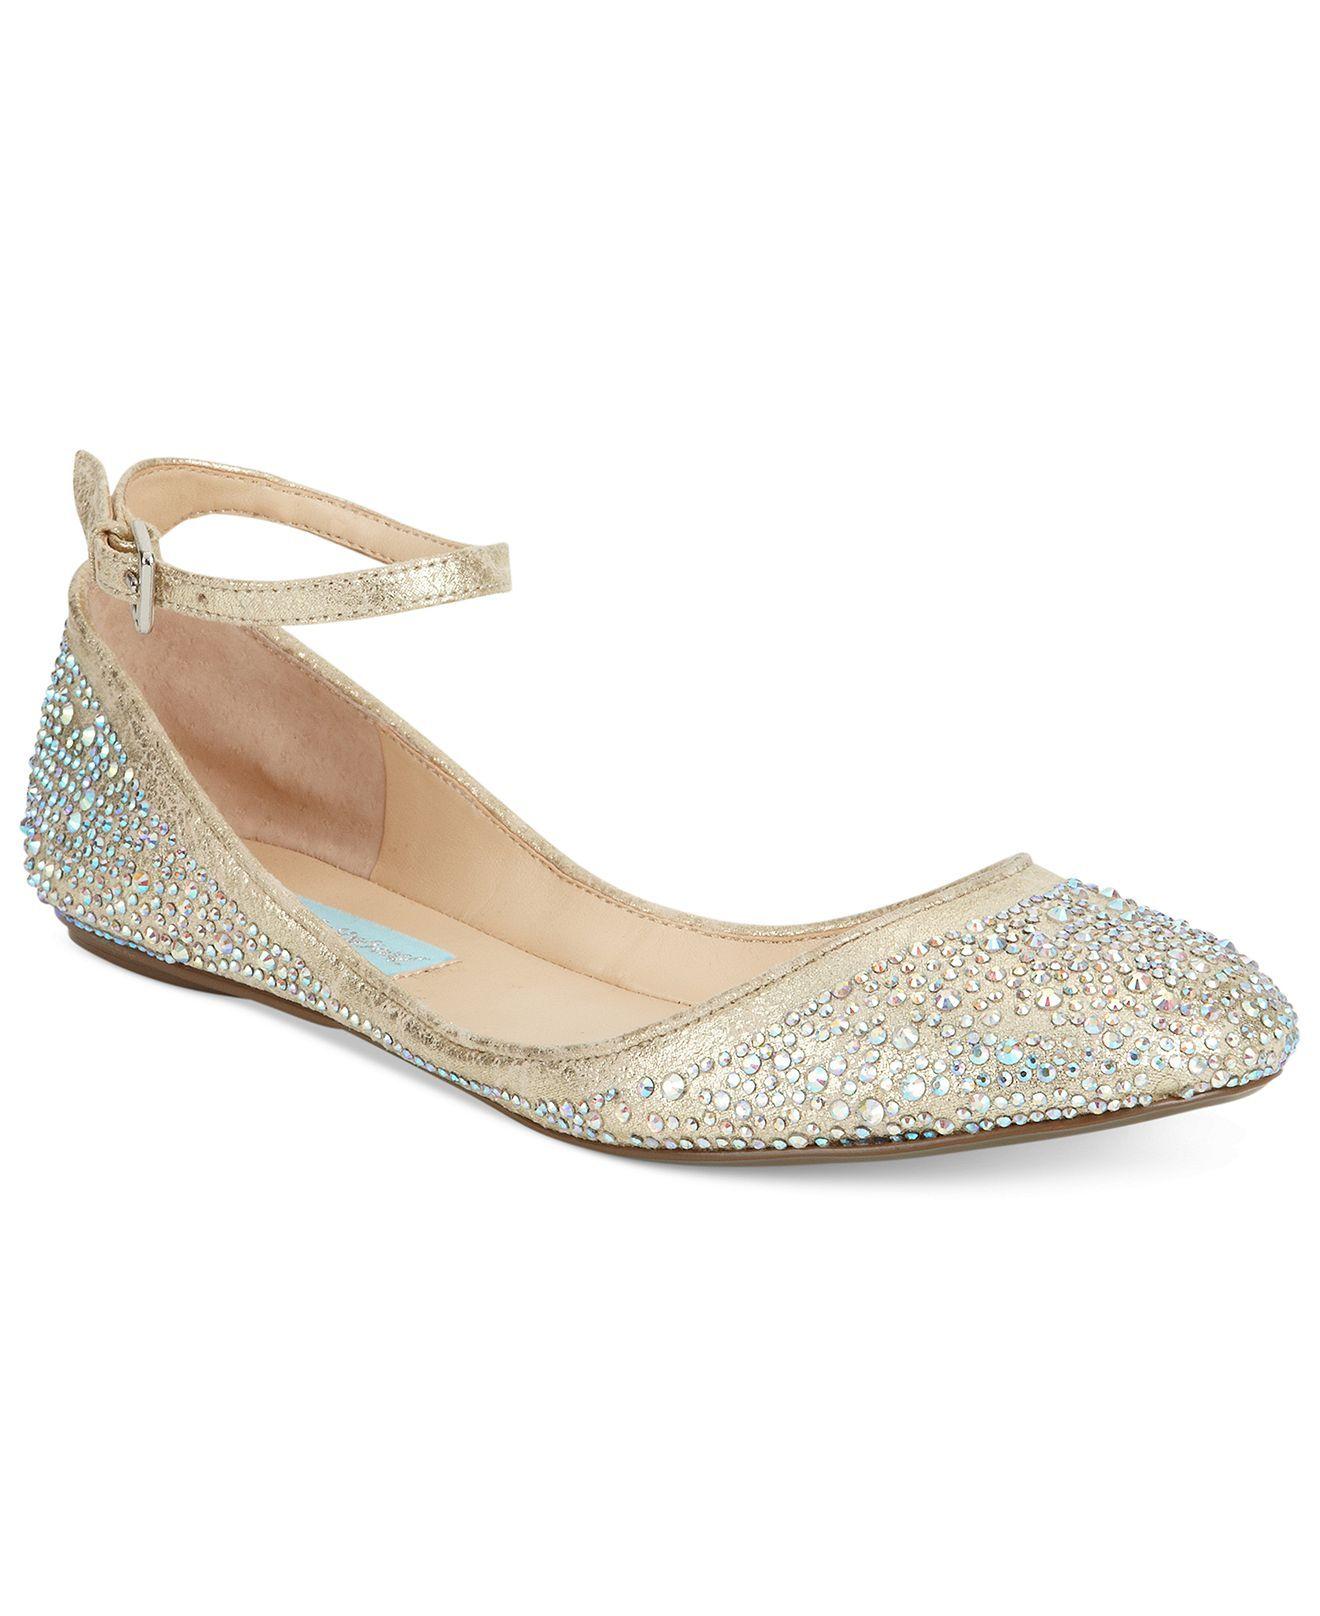 betsey johnson wedding shoes Blue by Betsey Johnson Joy Evening Flats Evening Bridal Shoes Macy s WEDDING